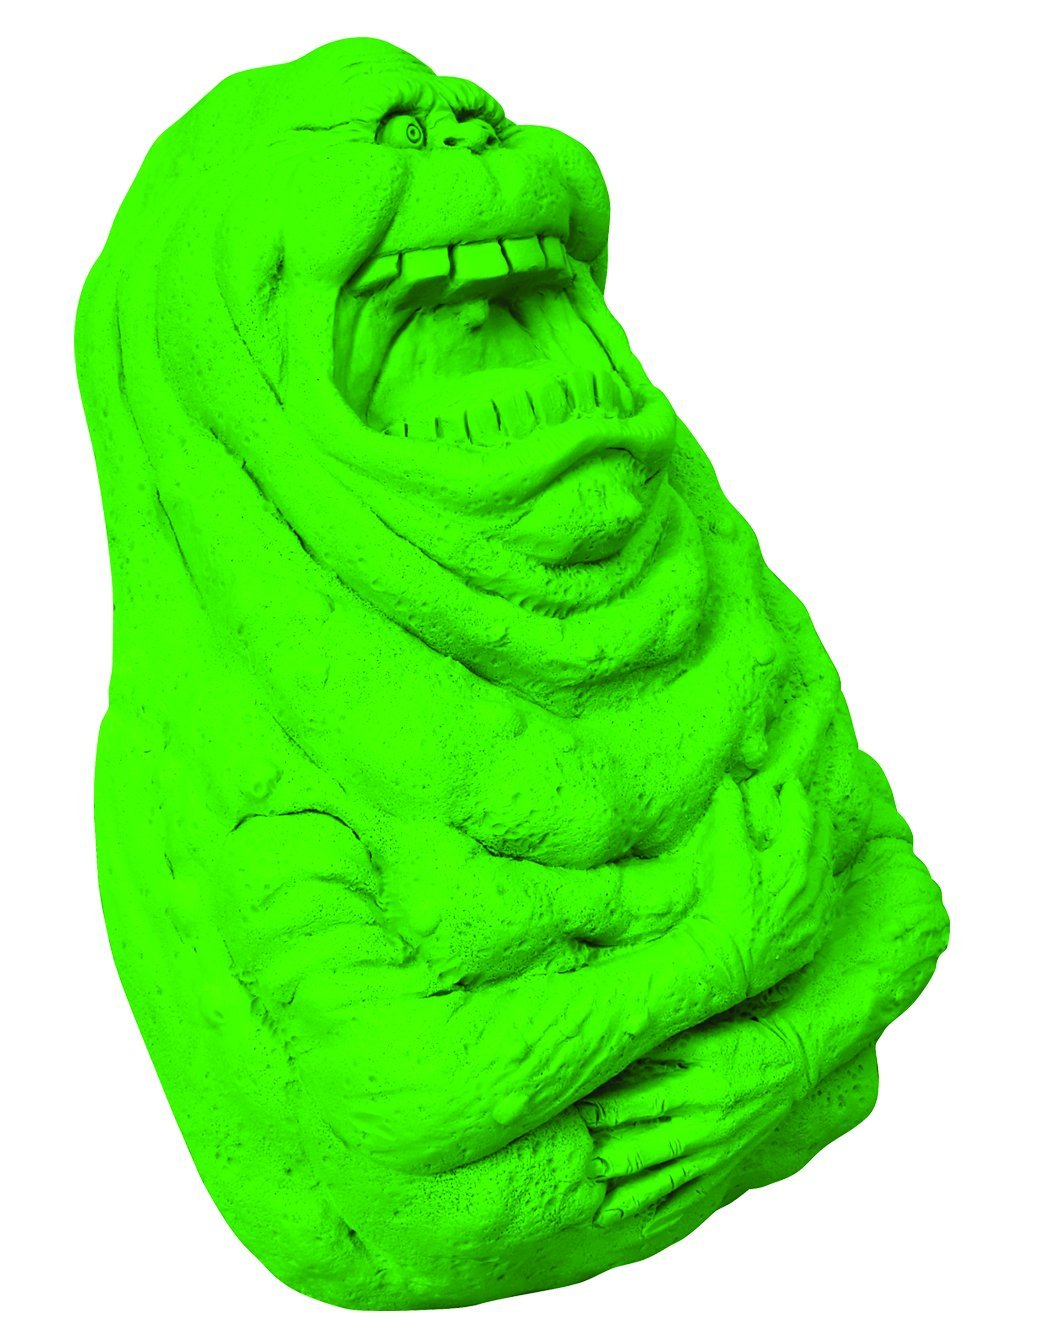 'Ghostbusters' Slimer Gelatin Mold